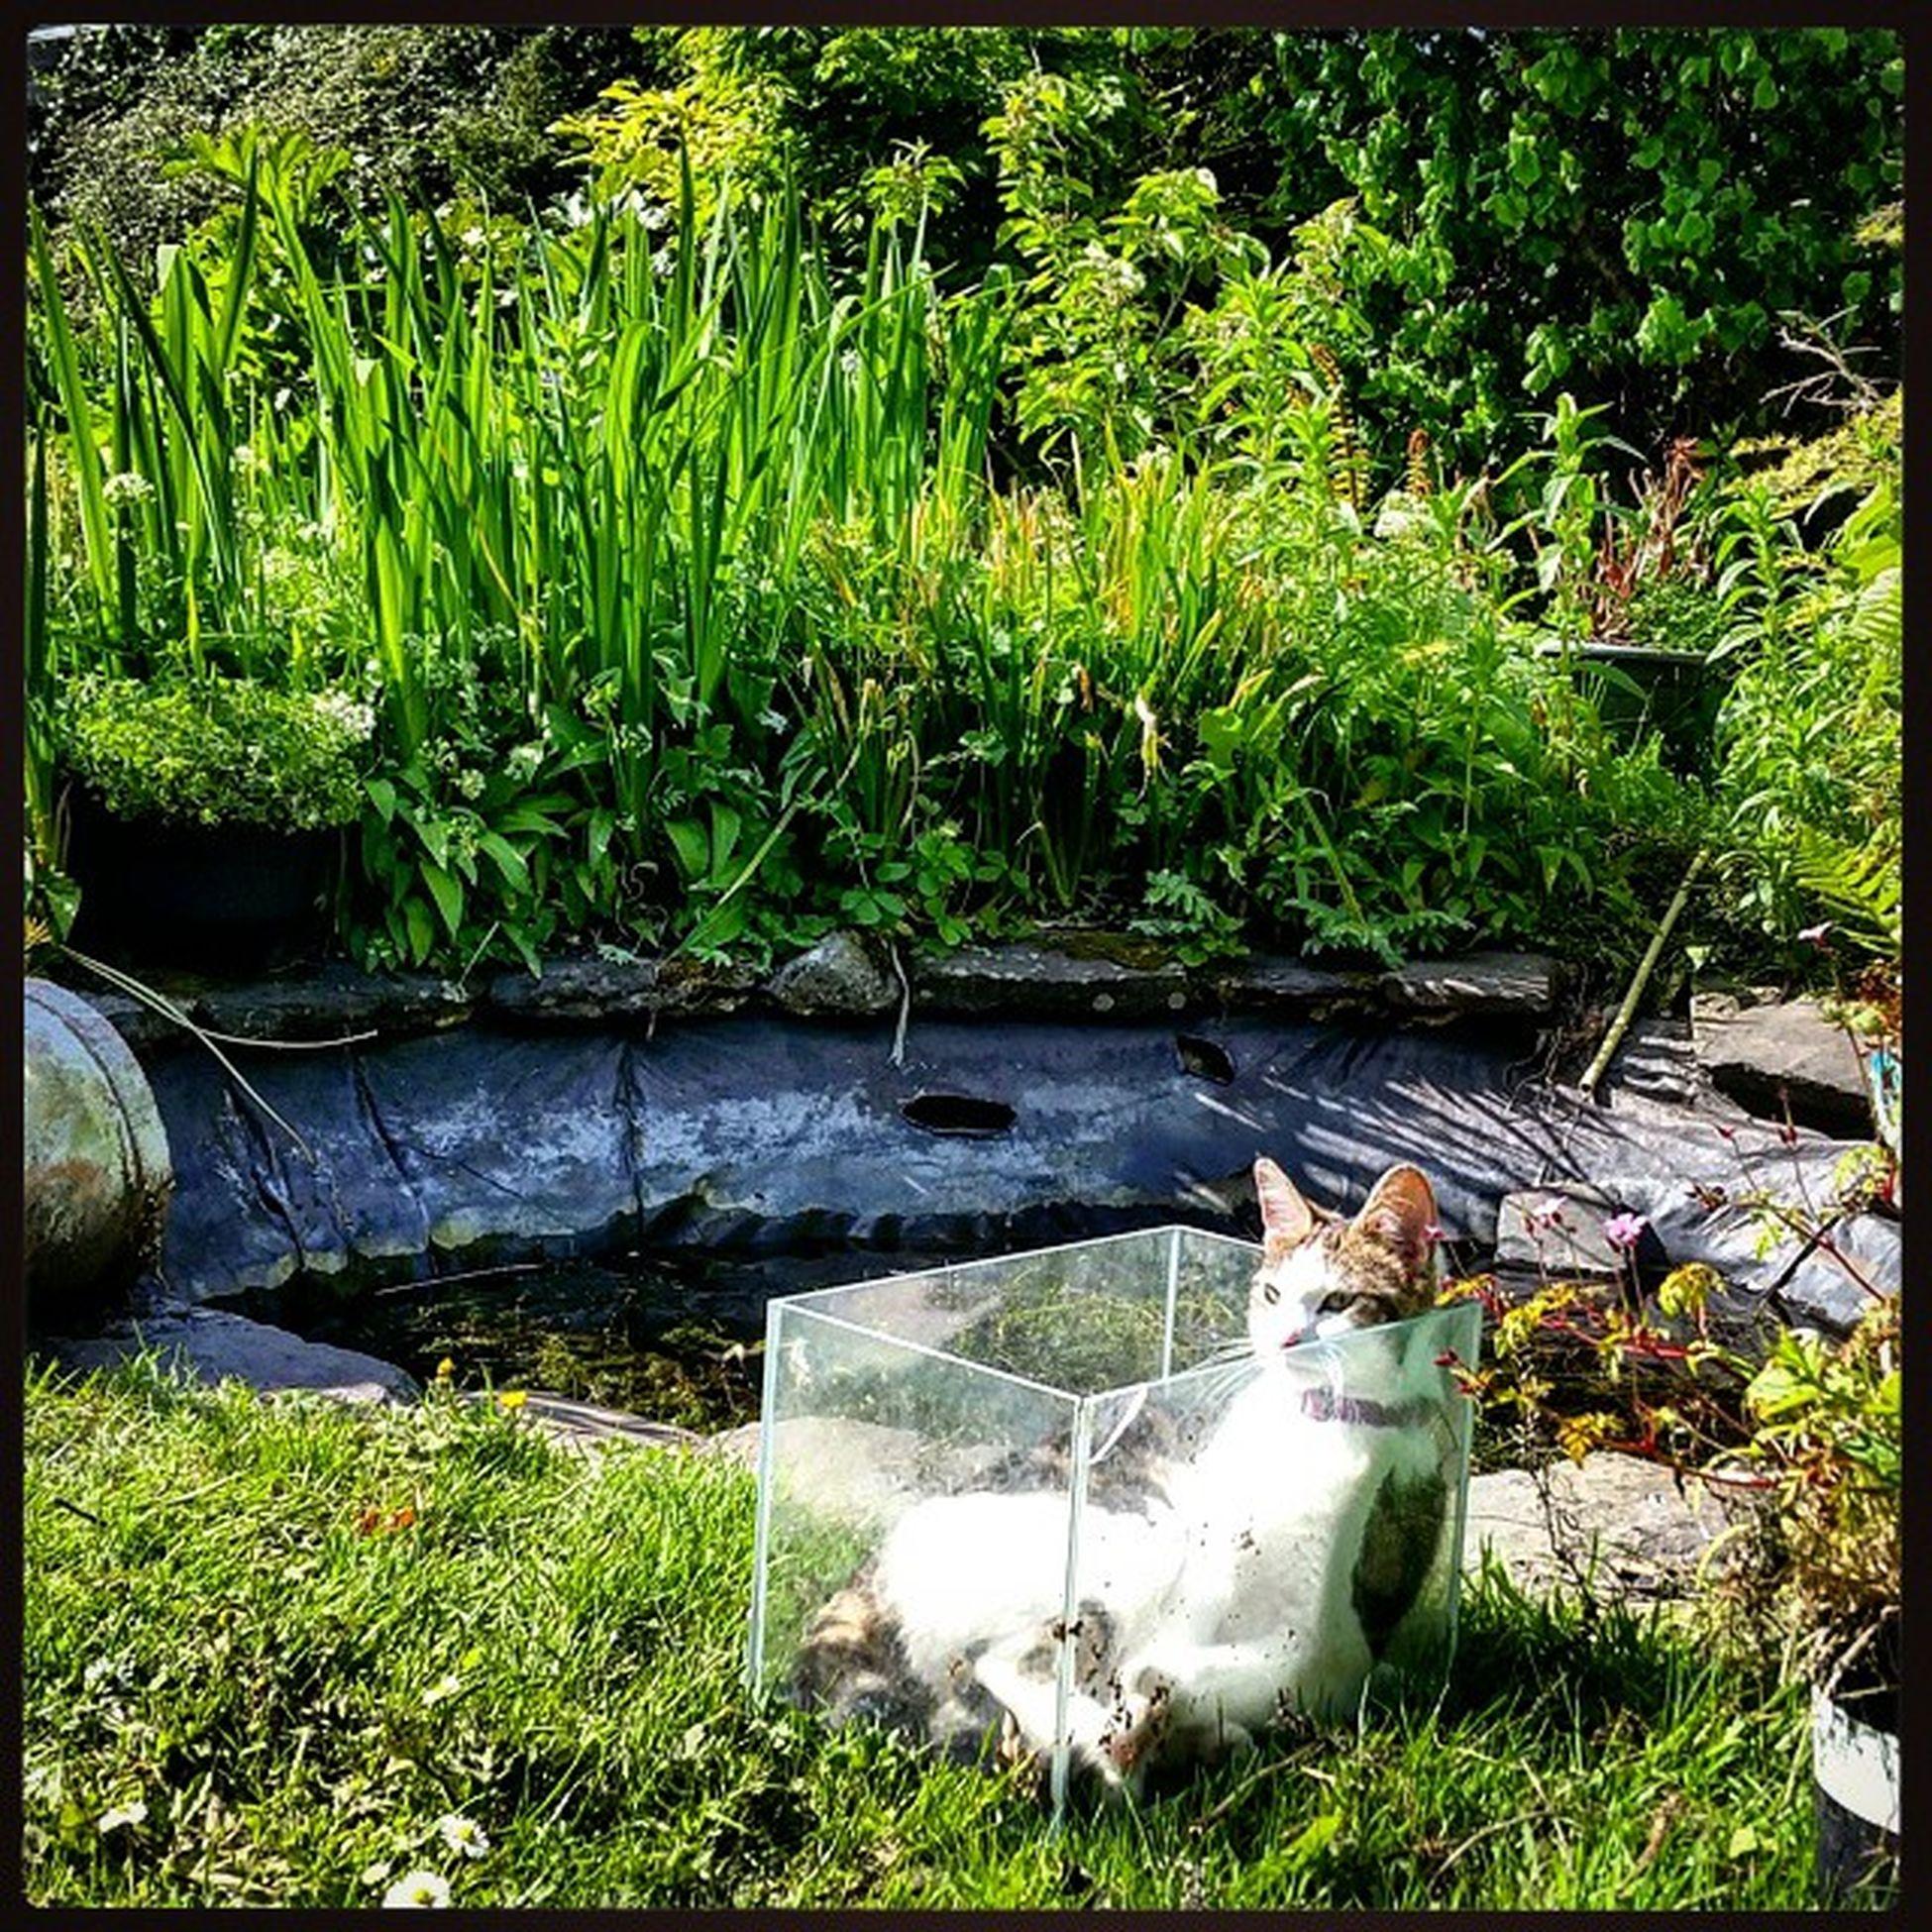 Elsa just relaxing in an old fish tank today enjoying the sun! 😂 Crazykitten Cats Catmojo Petsofinstagram Catsofinstagram Animallove